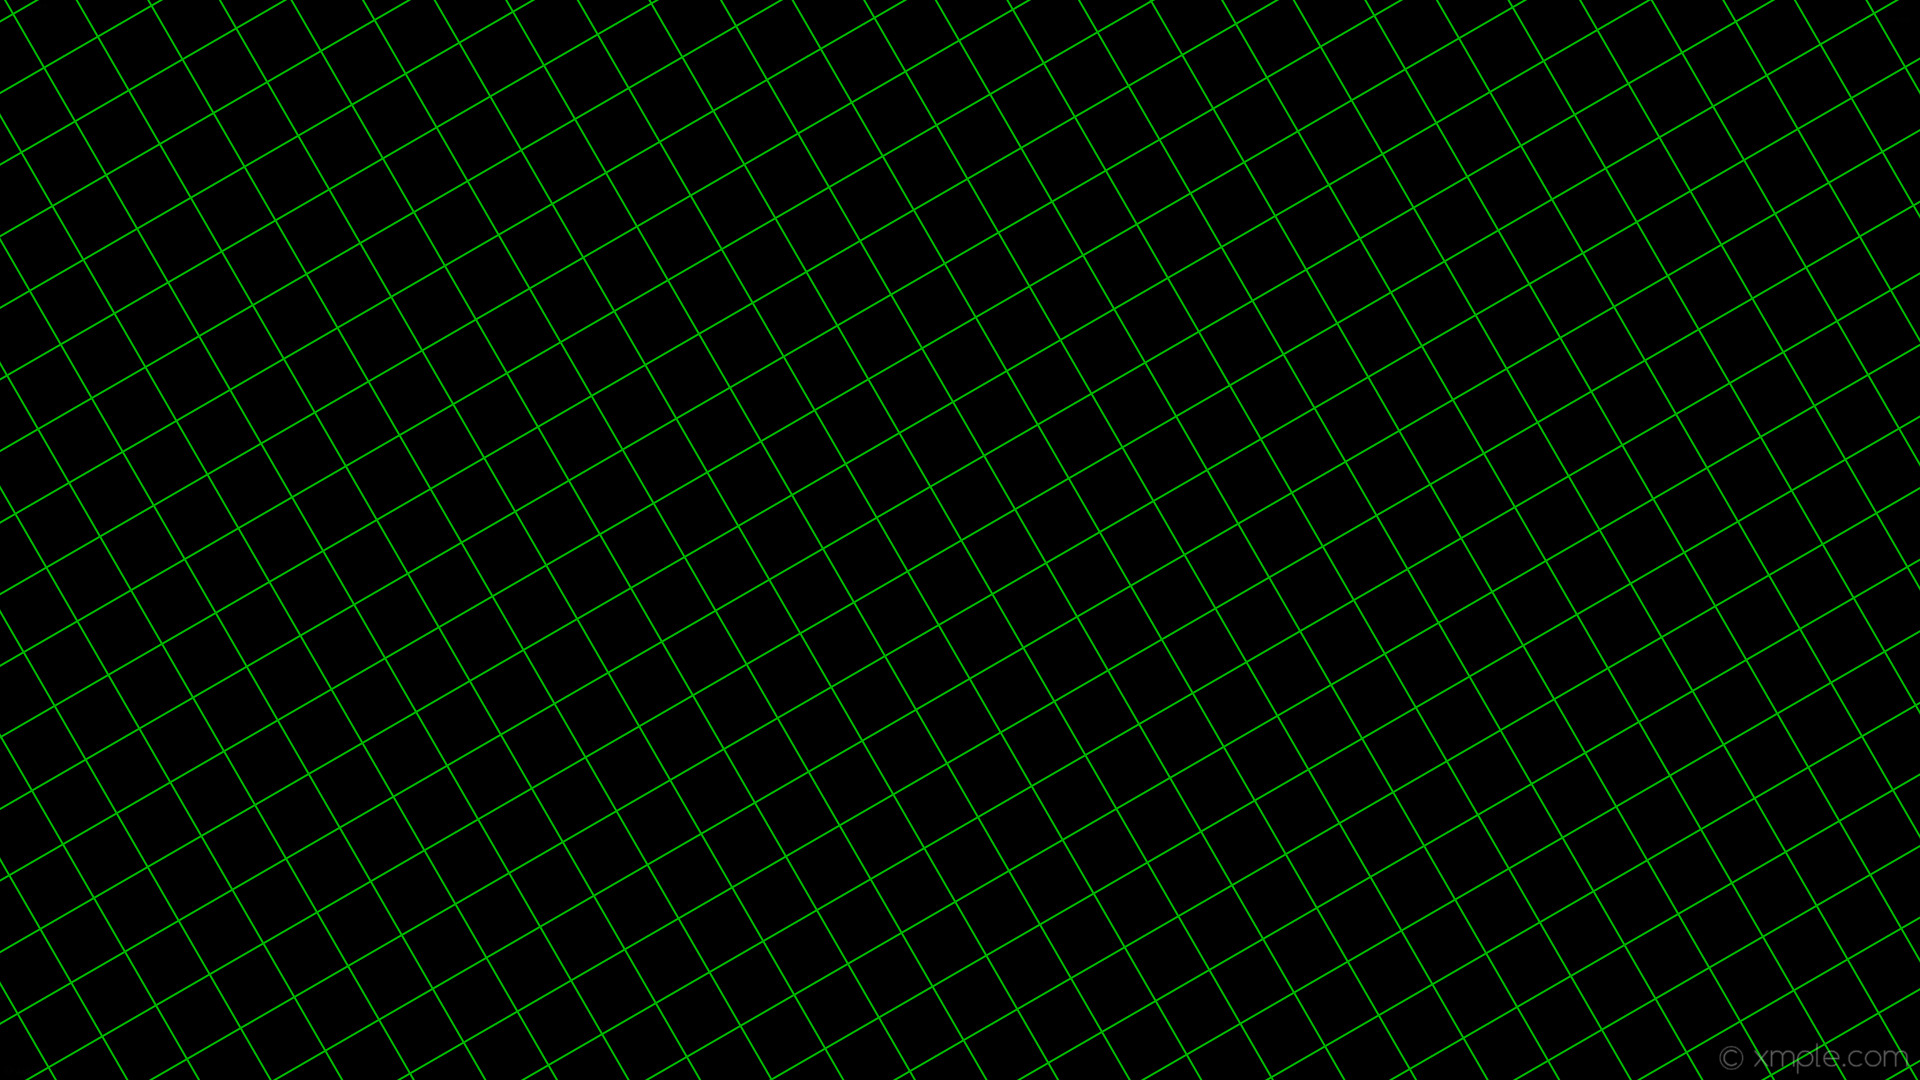 wallpaper graph paper black green grid lime #000000 #00ff00 30° 2px 62px